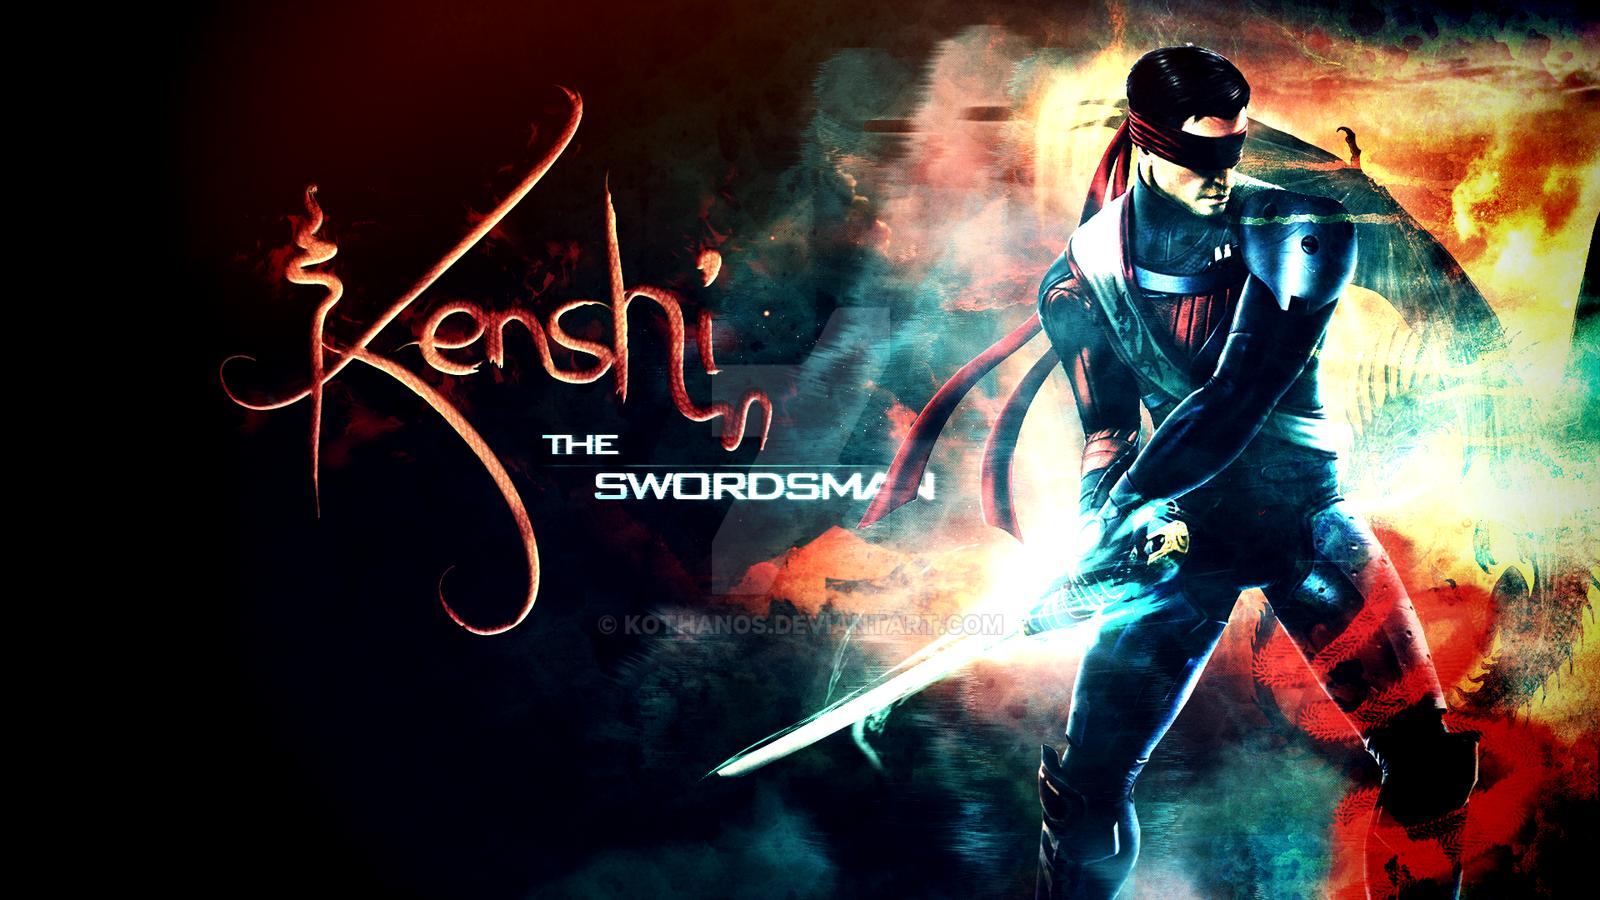 Kenshi the Swordsman - Mortal Kombat - Fan Art by Kothanos